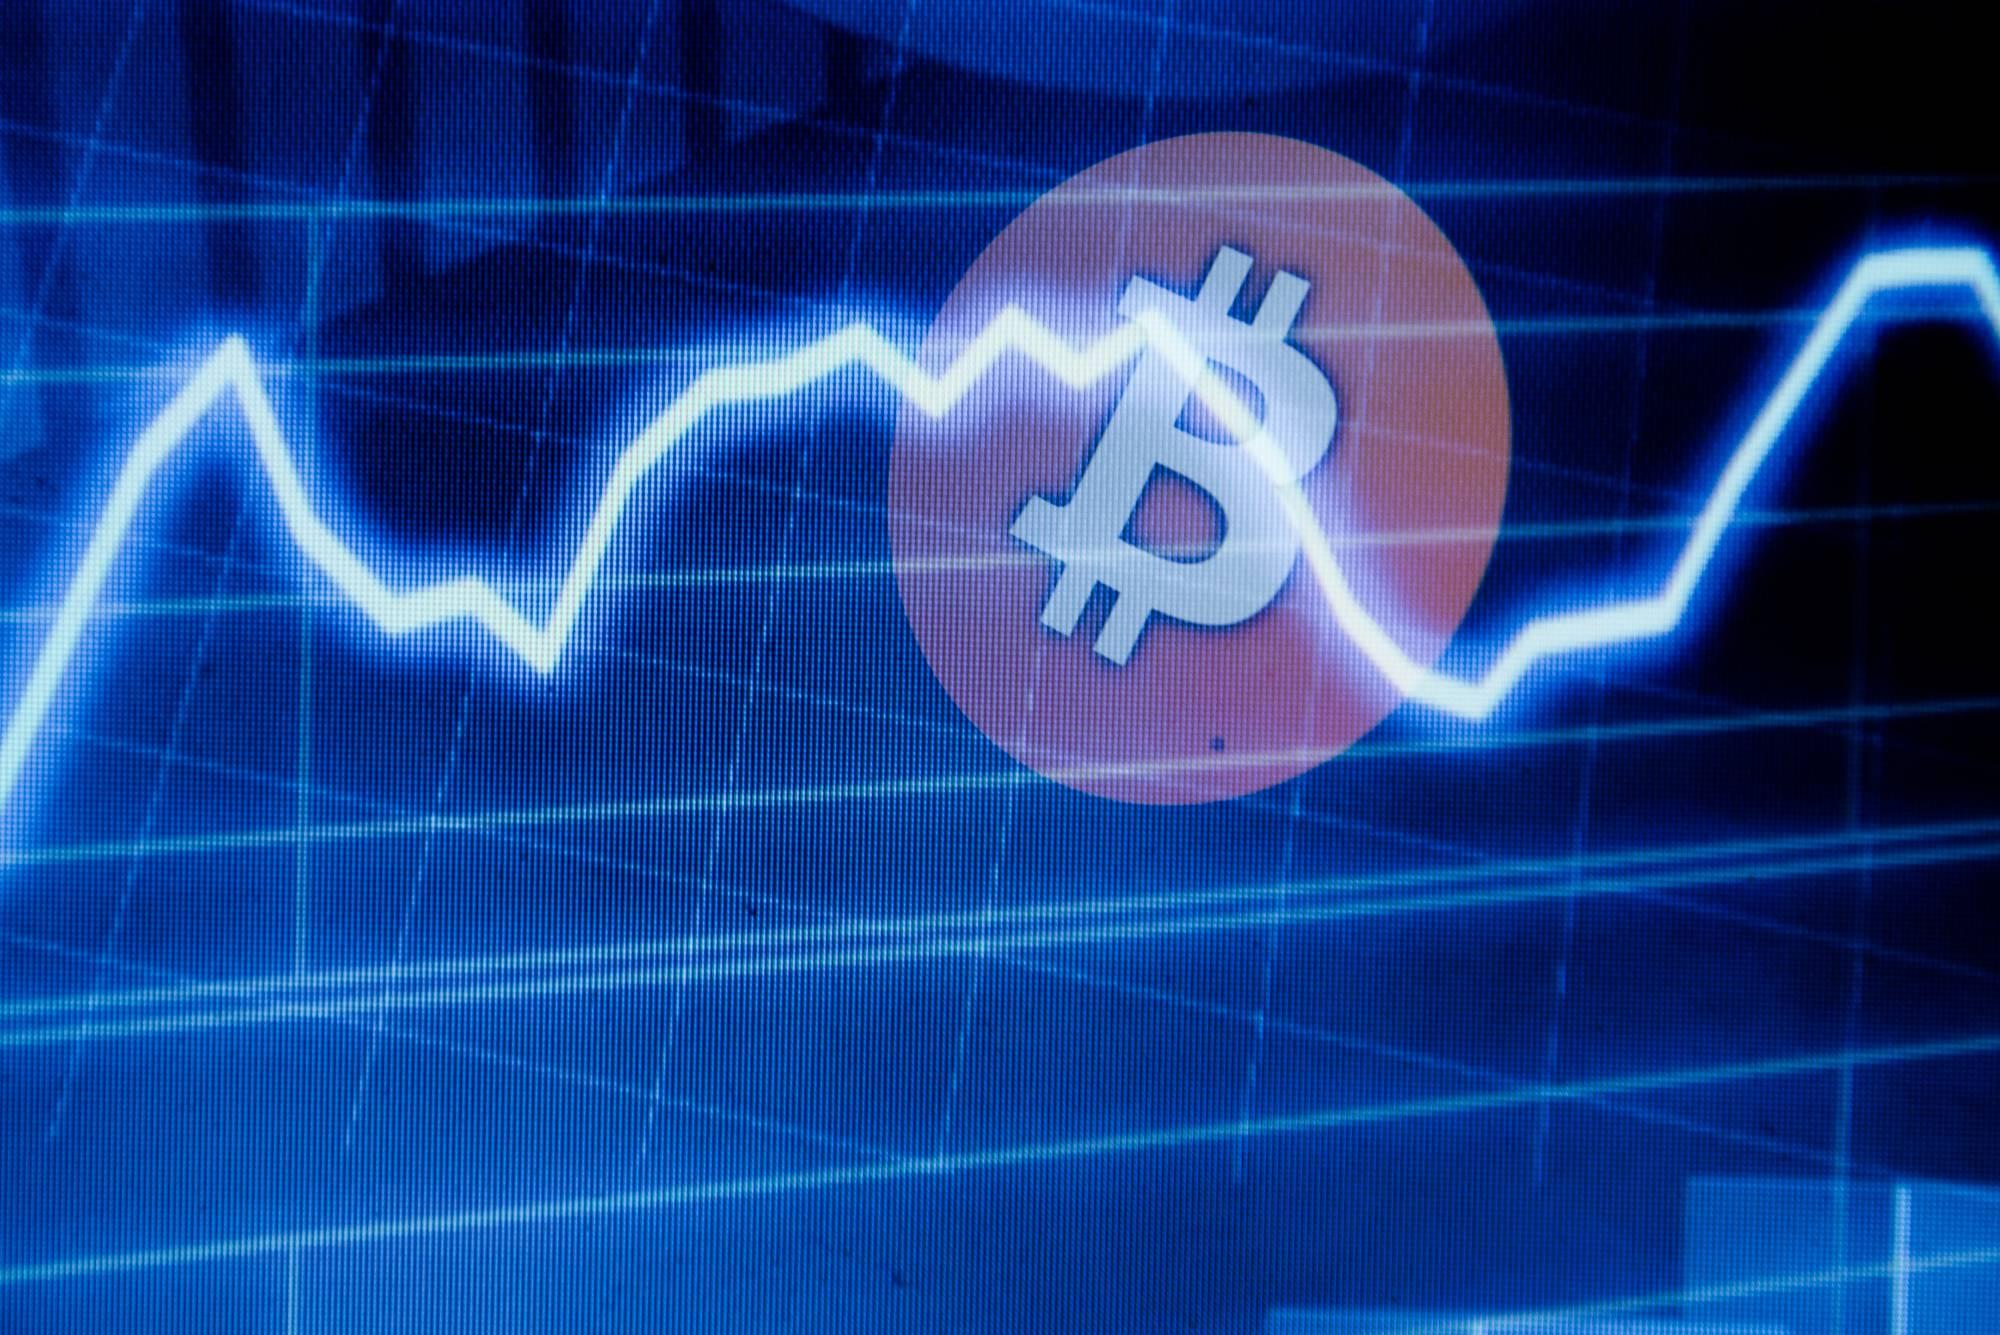 bitcoin digital currency chart